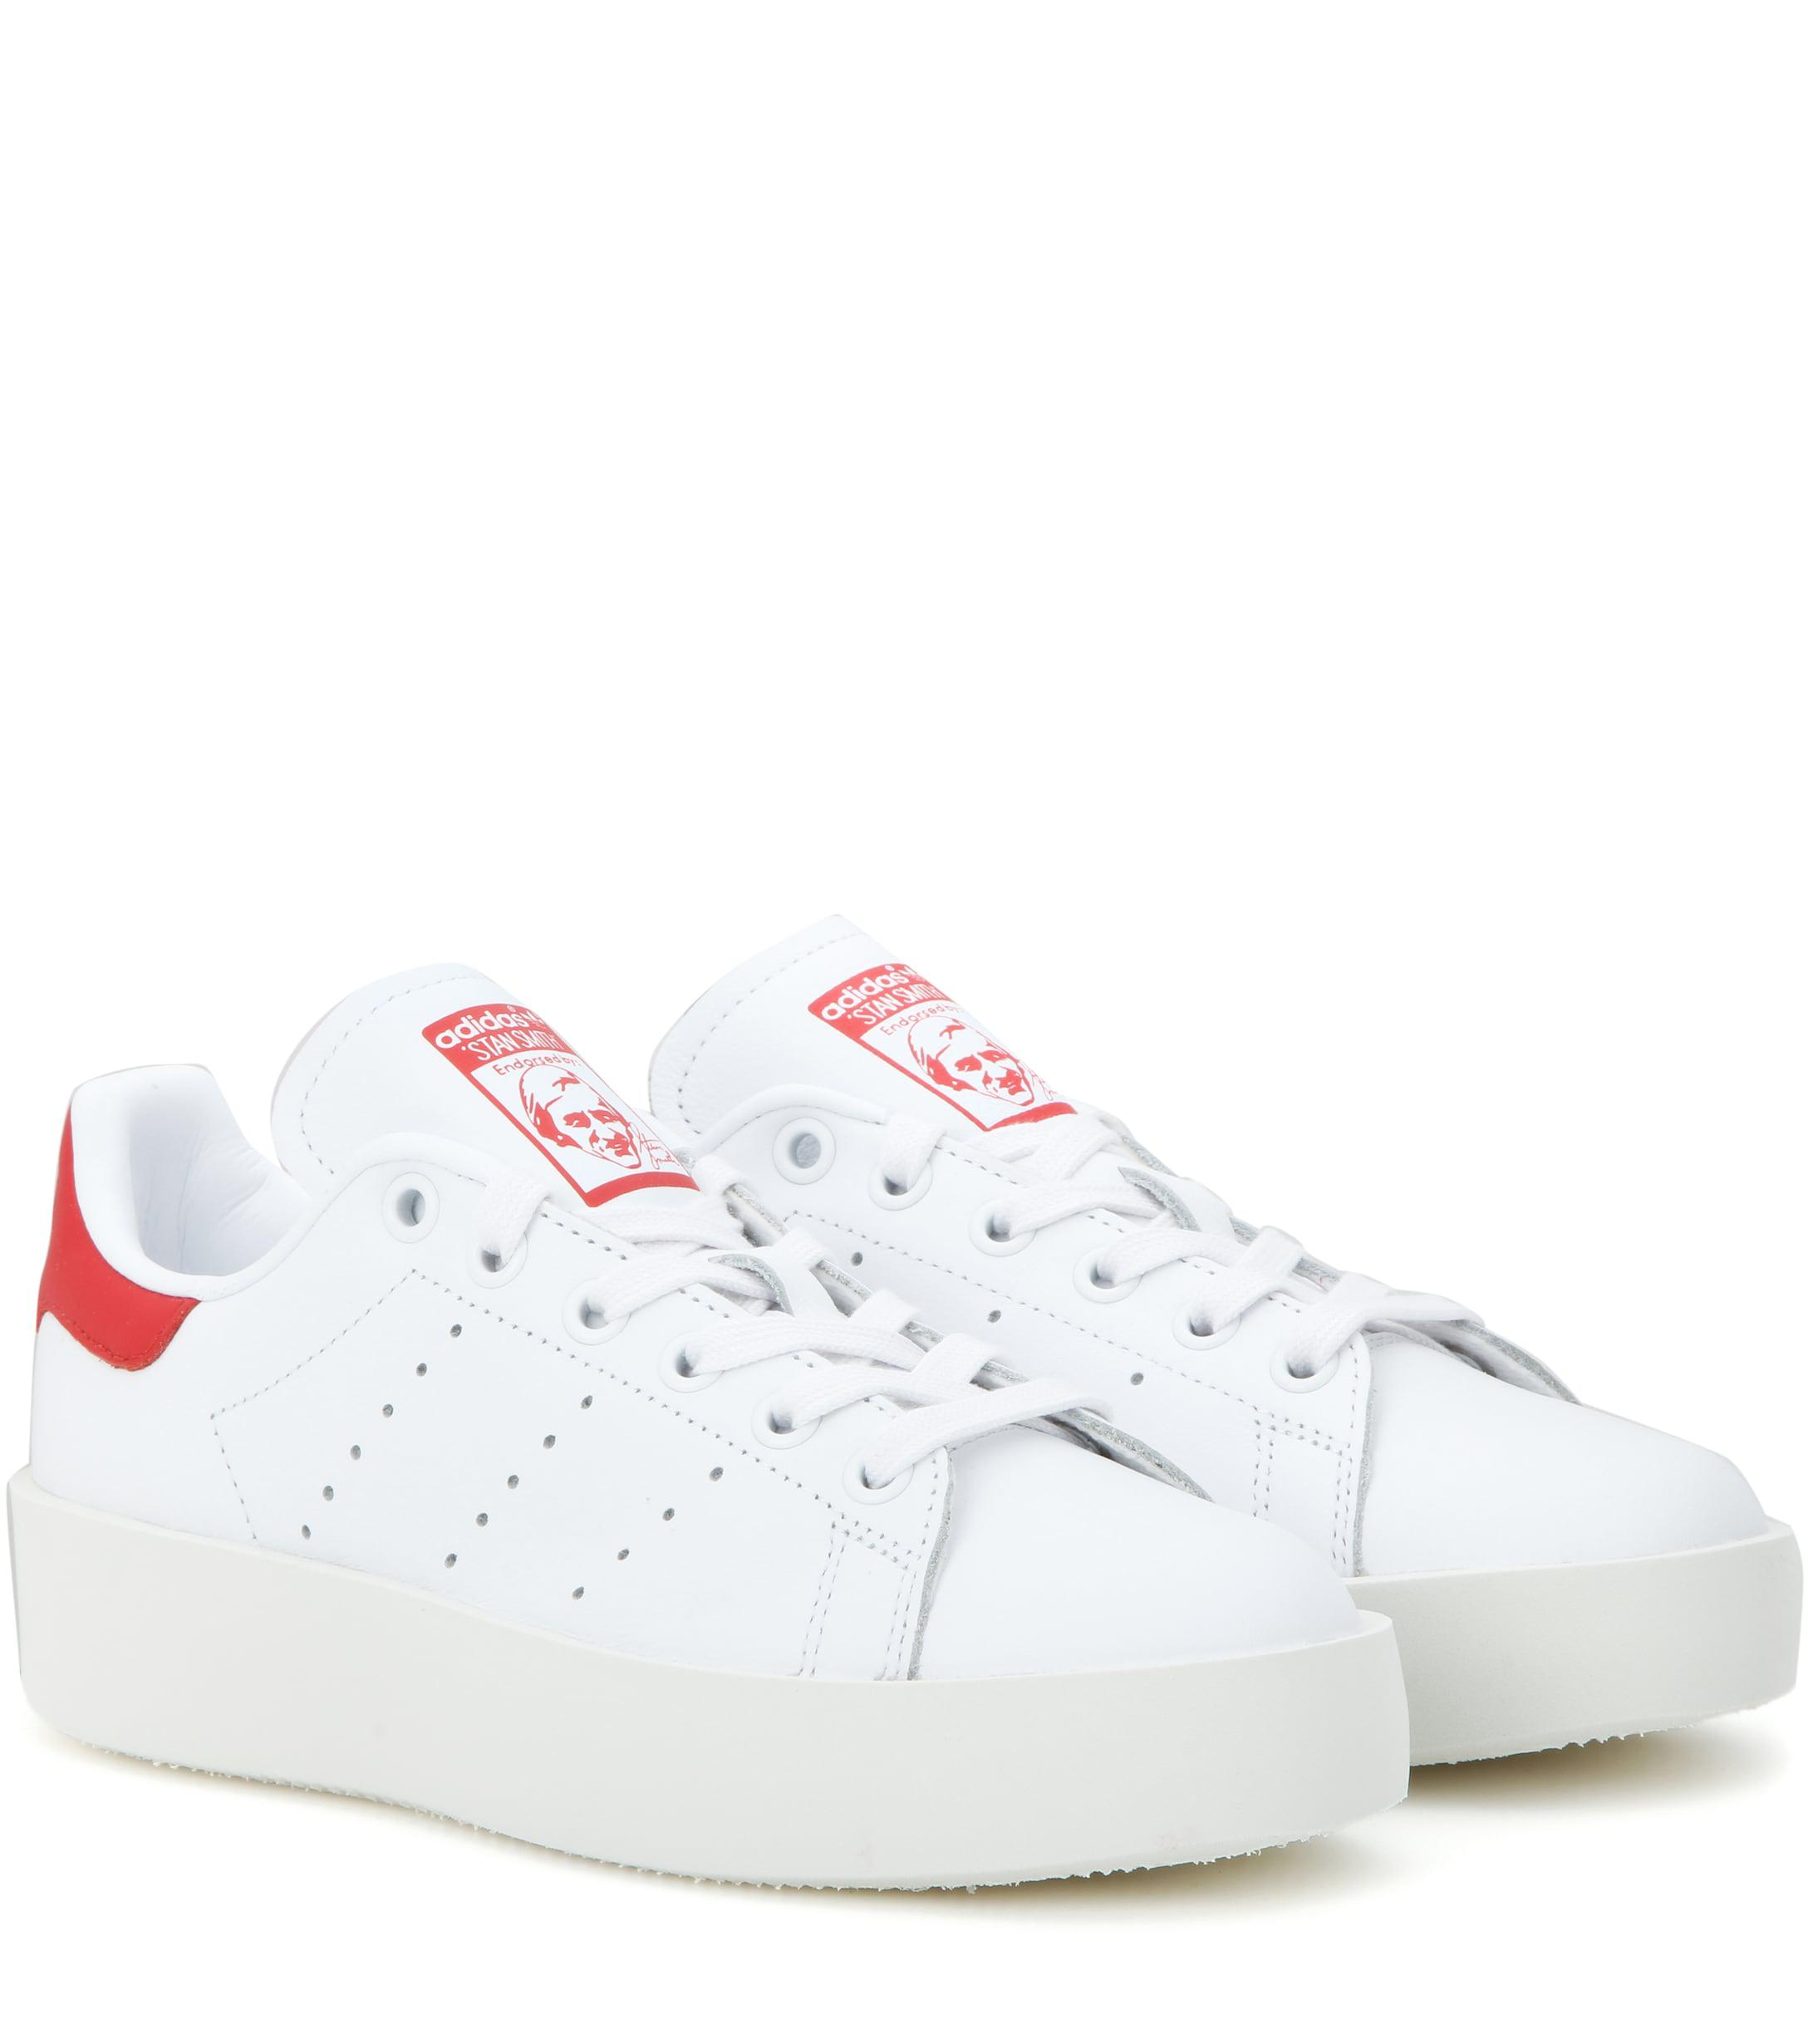 acbf3c75e0b Adidas Originals Stan Smith Bold Leather Sneakers in White - Lyst